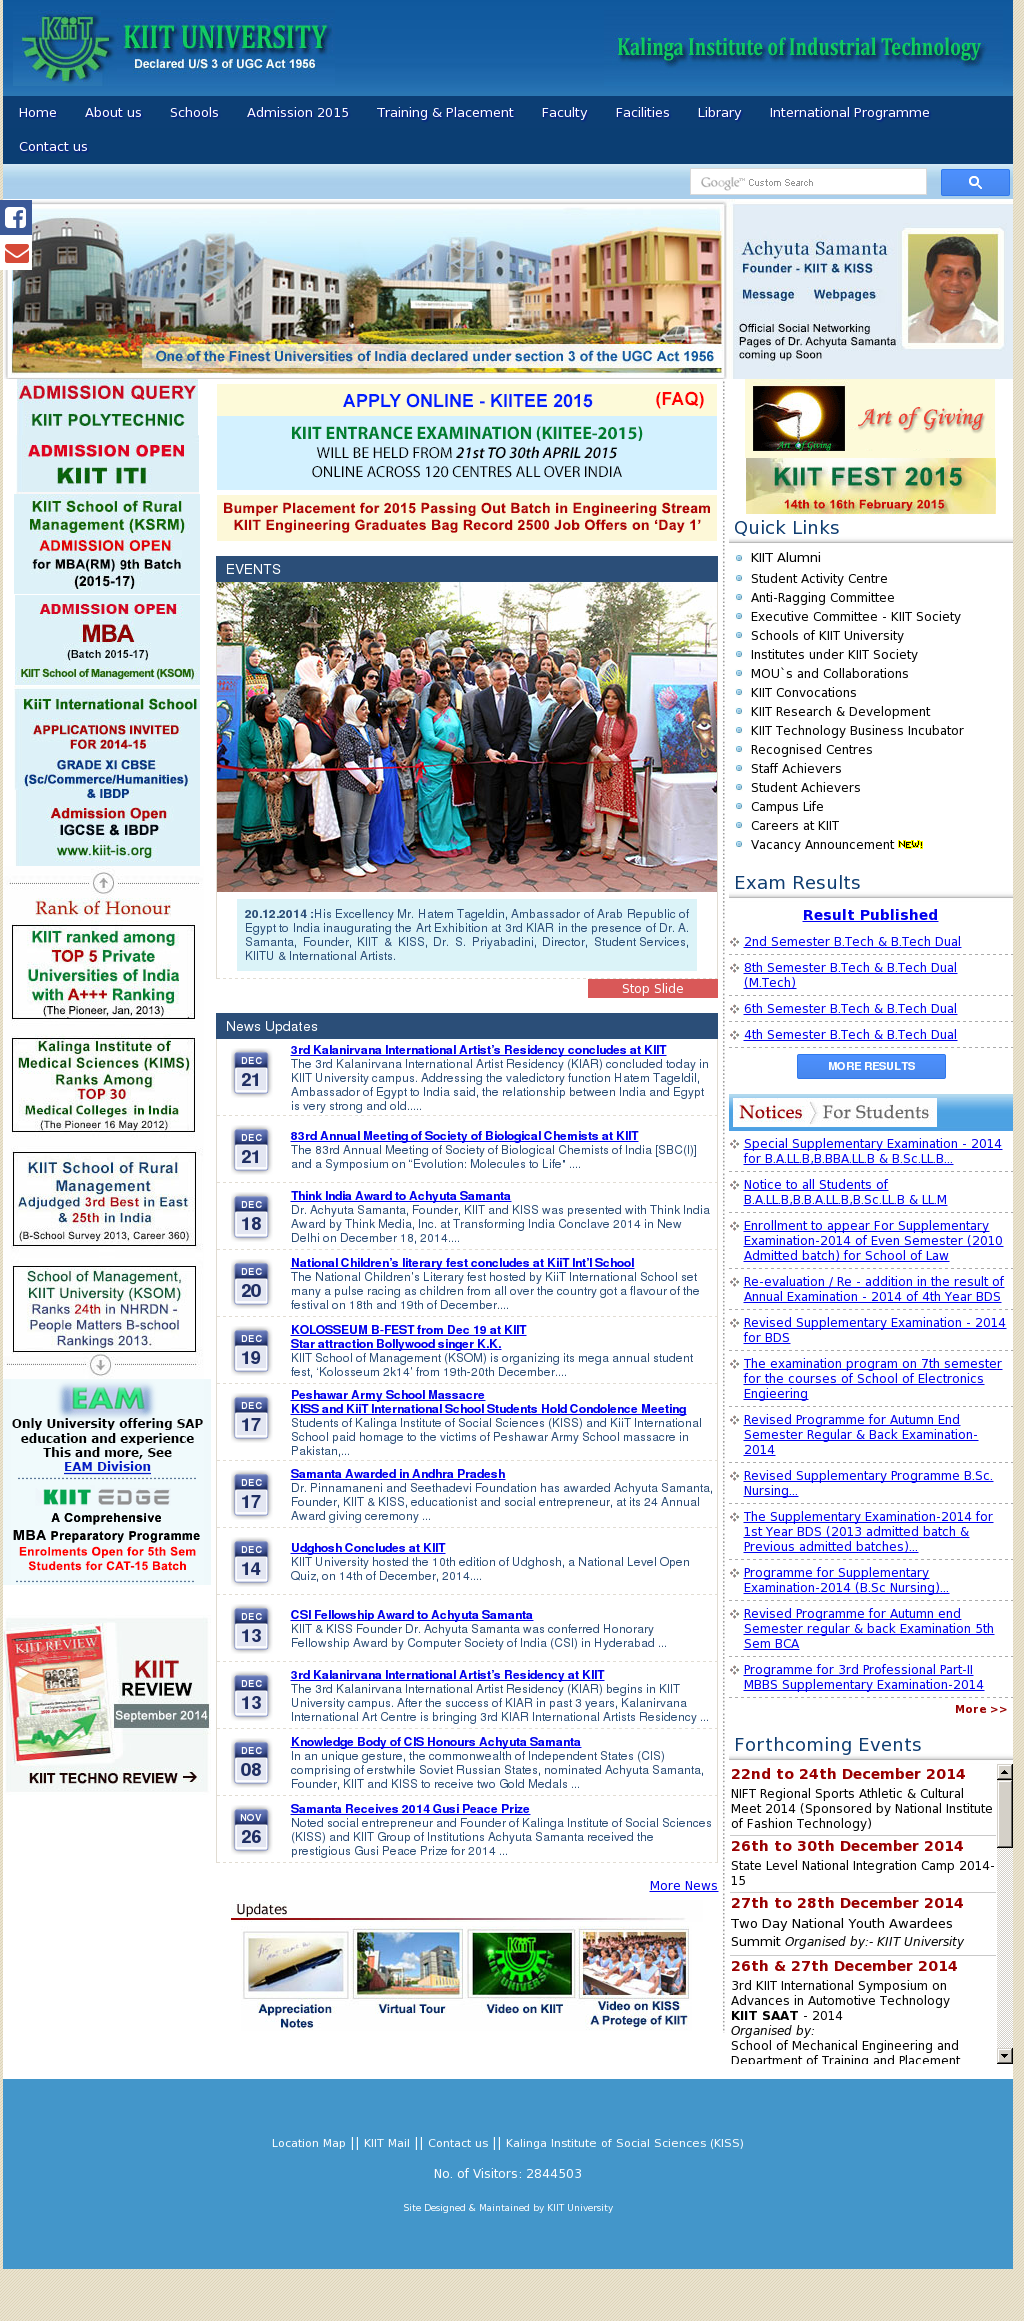 KIIT University Competitors, Revenue and Employees - Owler